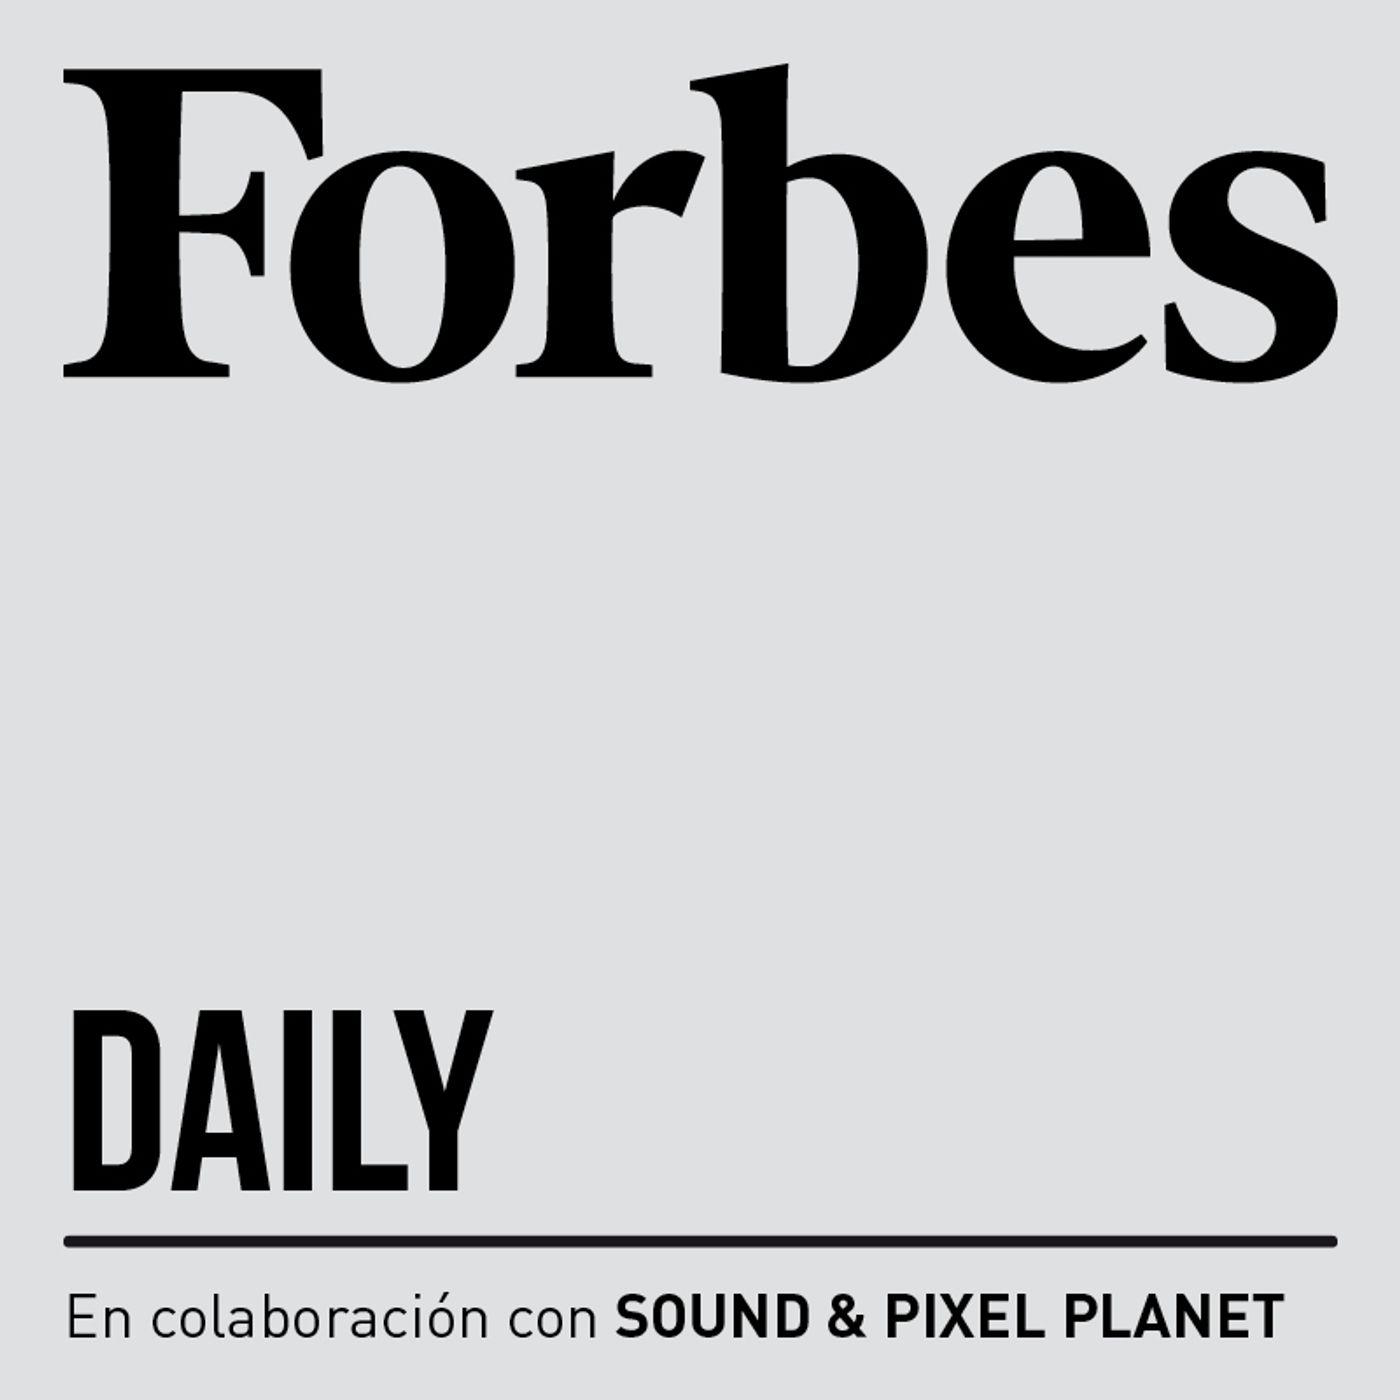 Logo de Forbes Daily